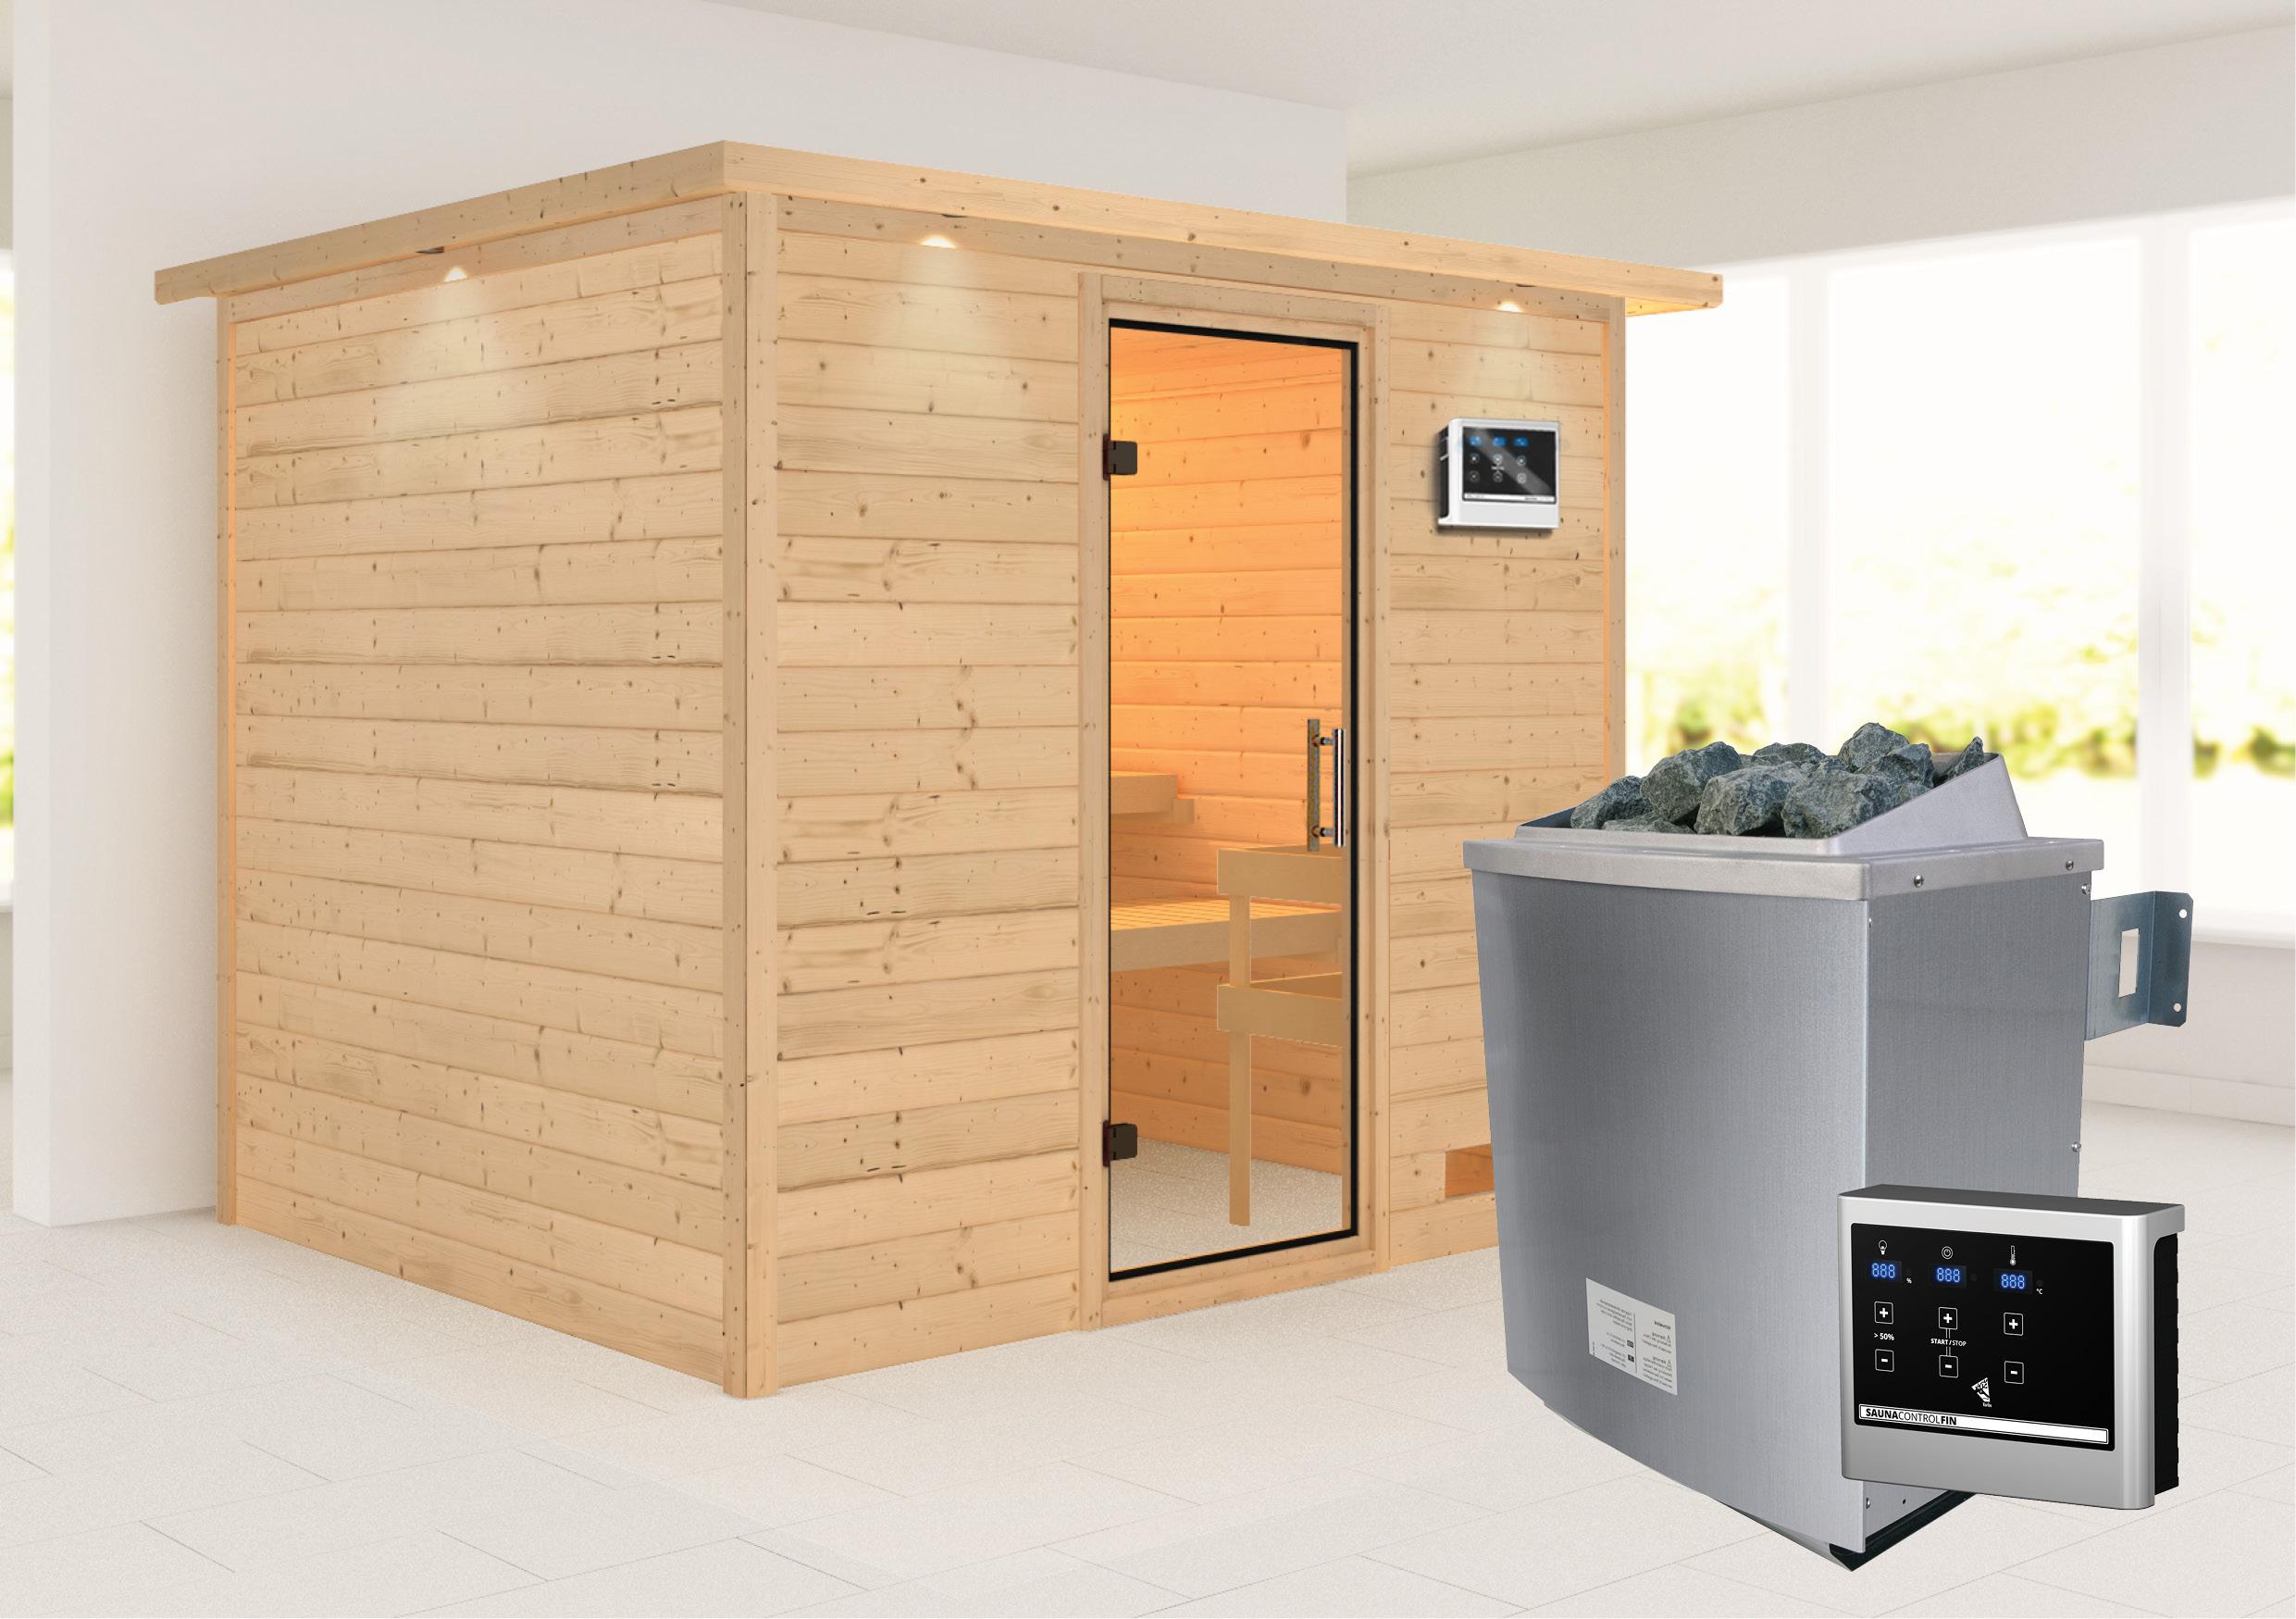 Woodfeeling Sauna Karla 38mm Kranz Ofen 9kW extern Tür Klarglas Bild 1